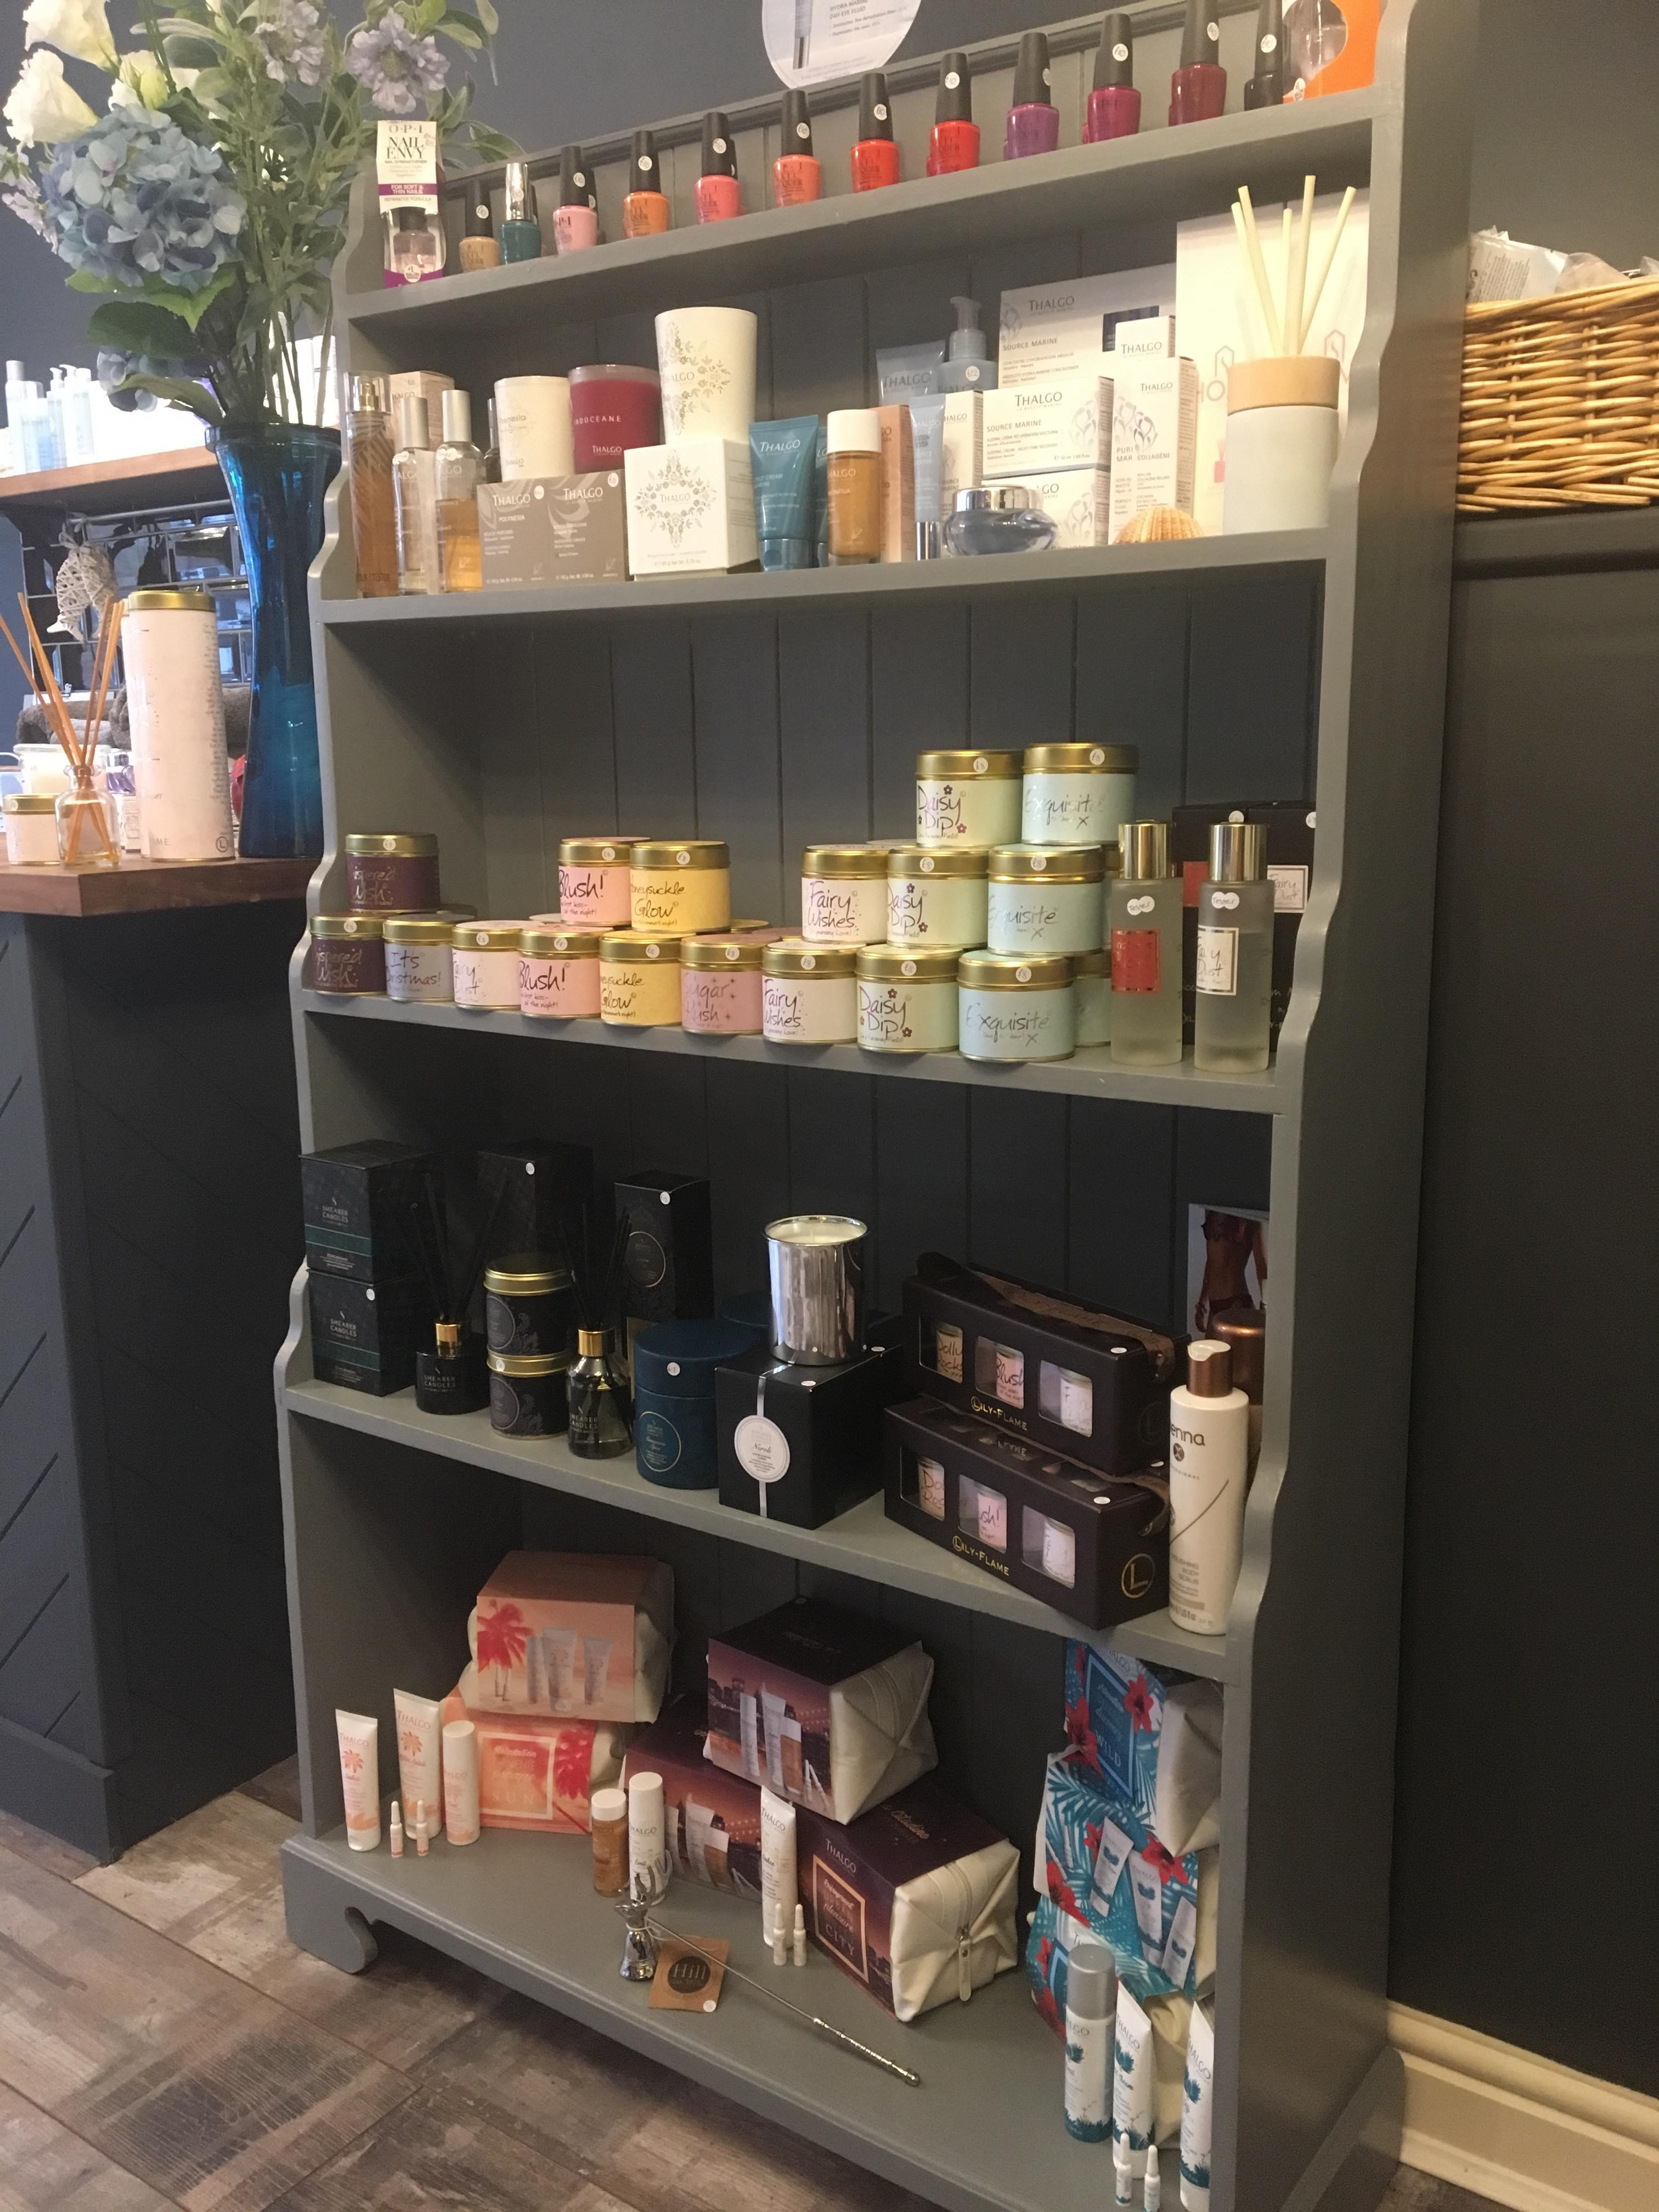 products shelf.jpg